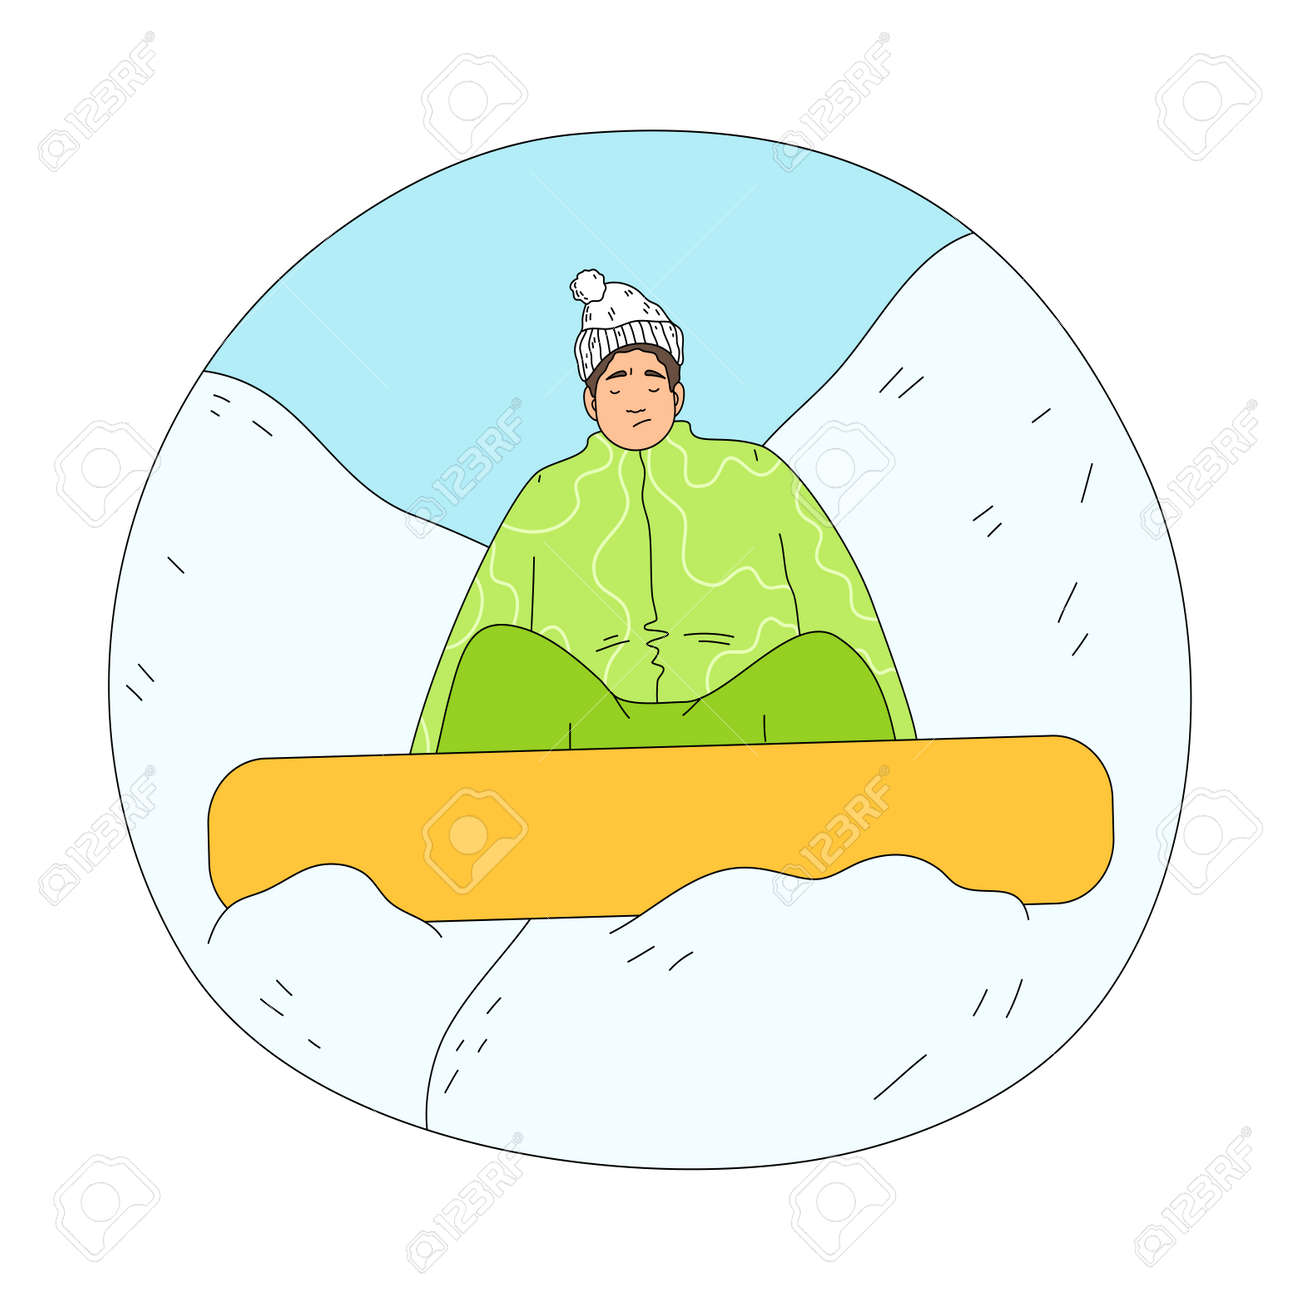 Man in green winter sportswear falling during practicing snowboarding - 162070068